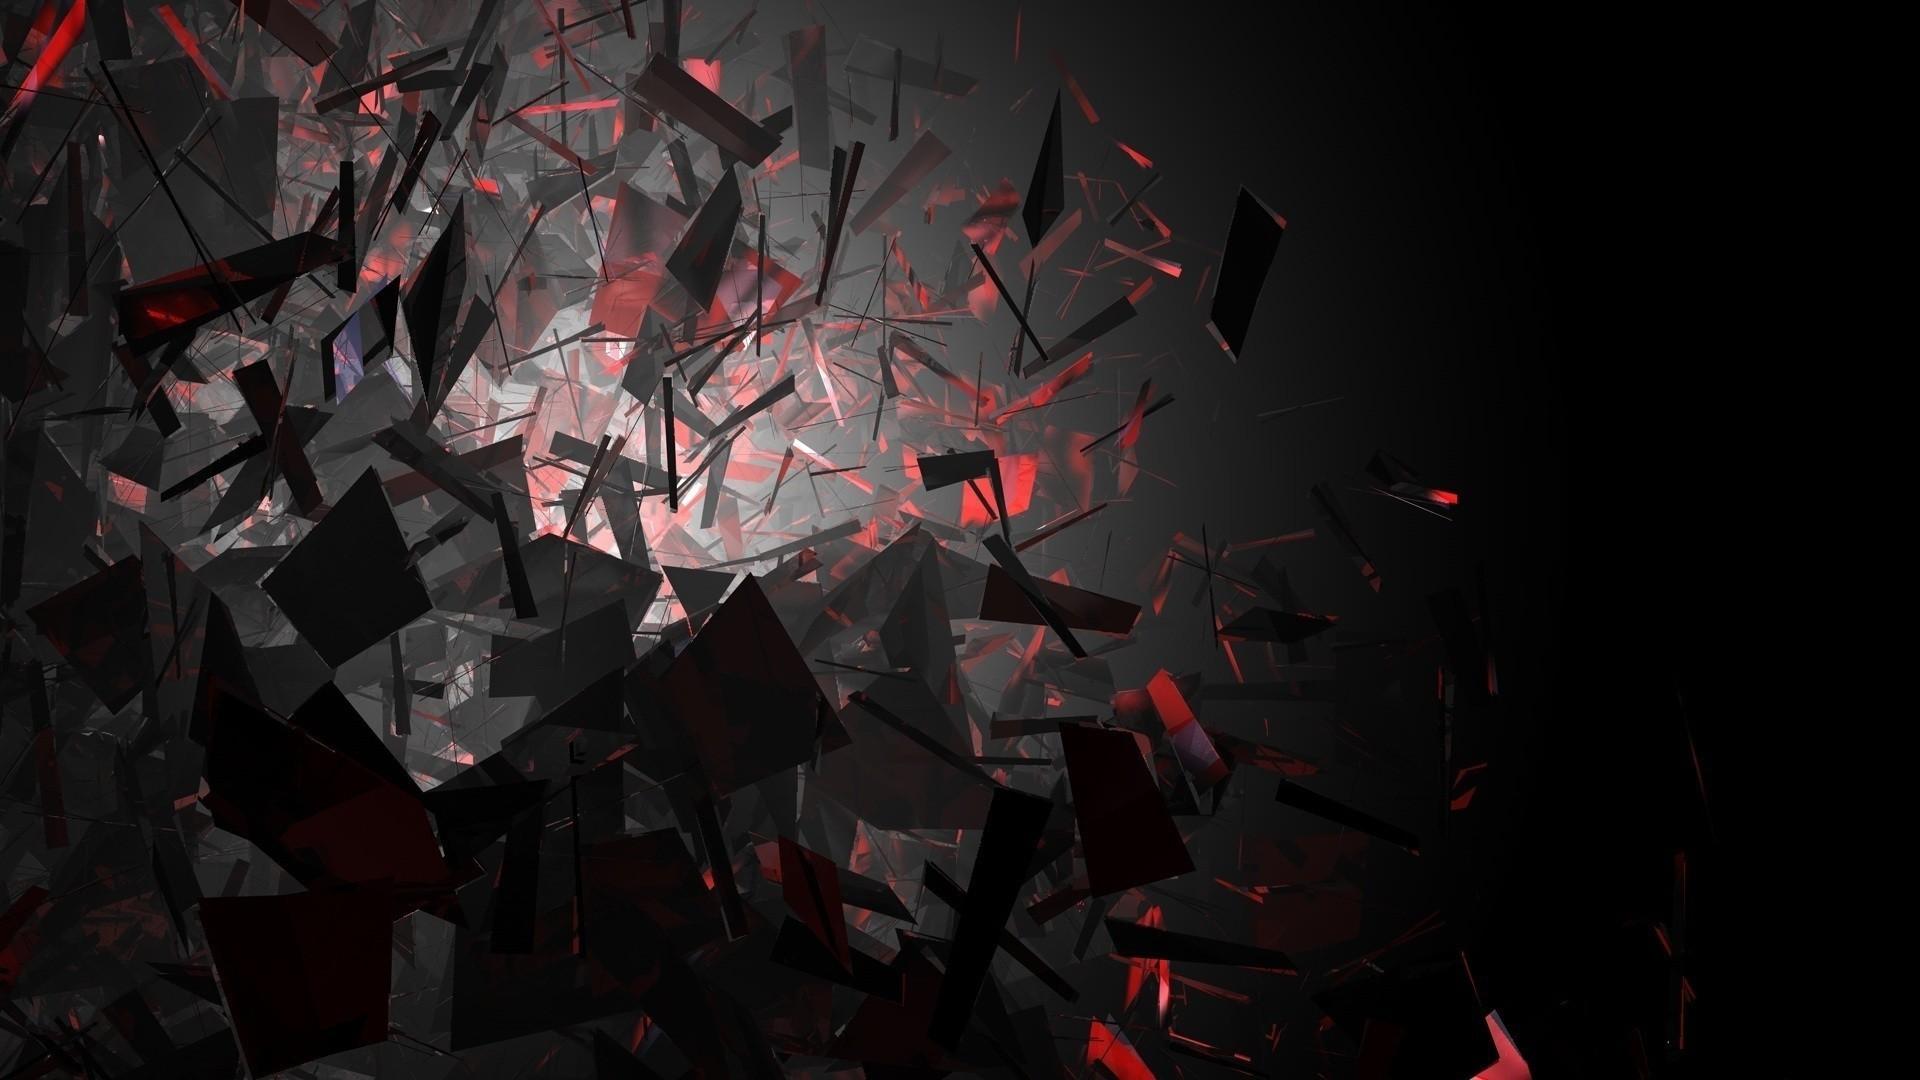 Abstract HD, Desktop Screen Pics, AHDzBooK Backgrounds